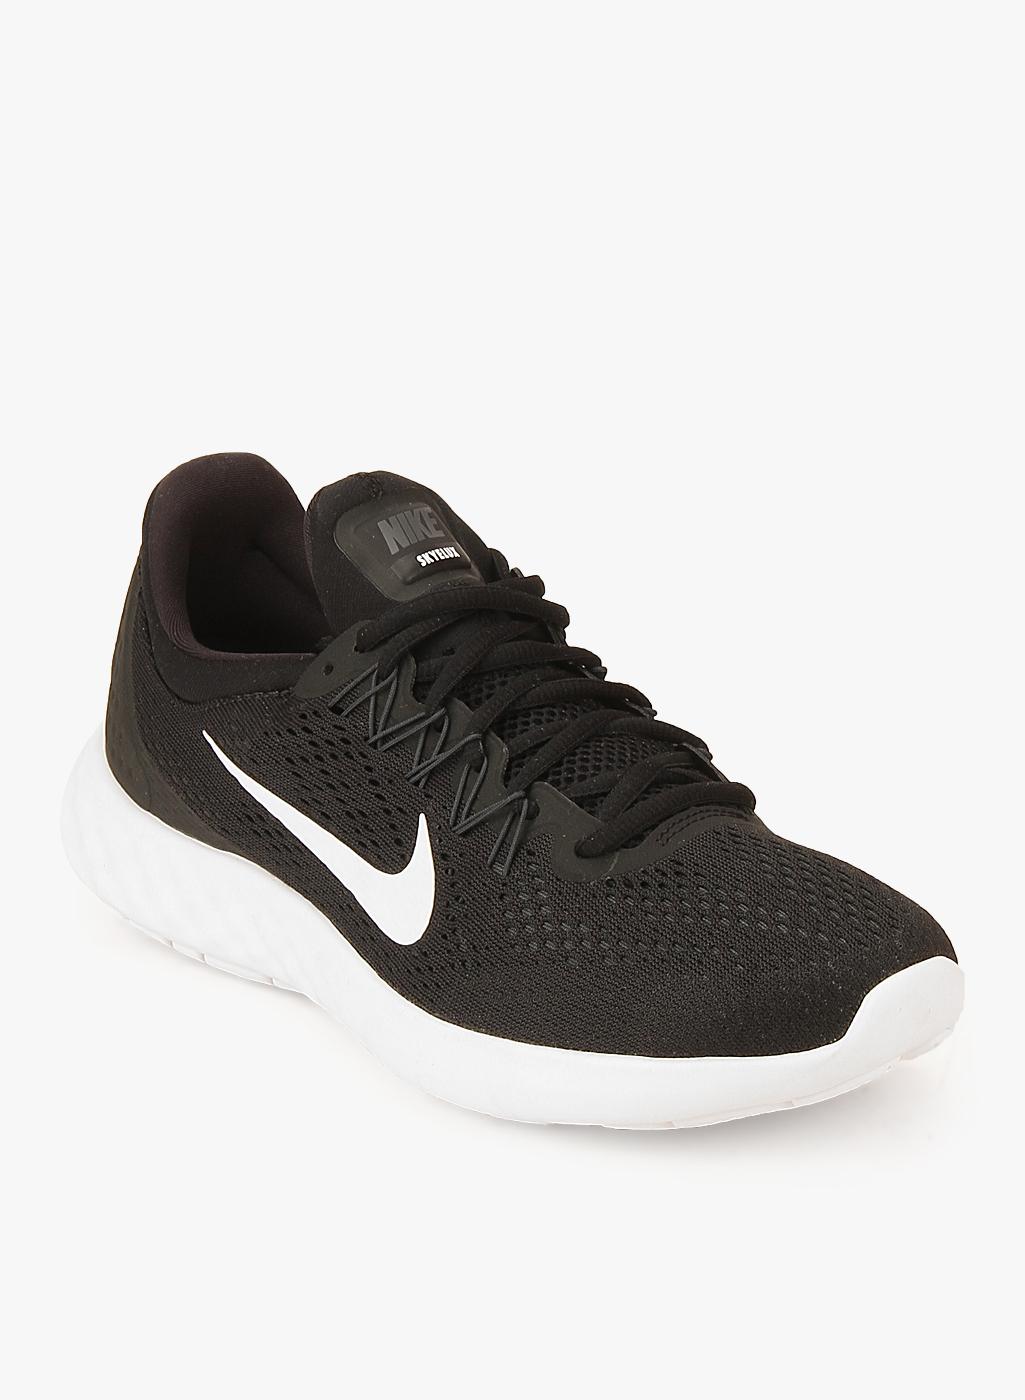 new arrivals bd4d1 c7918 Chaussures Running Nike Lunar Rose Enfants pas cher | Crazyprices.ch;